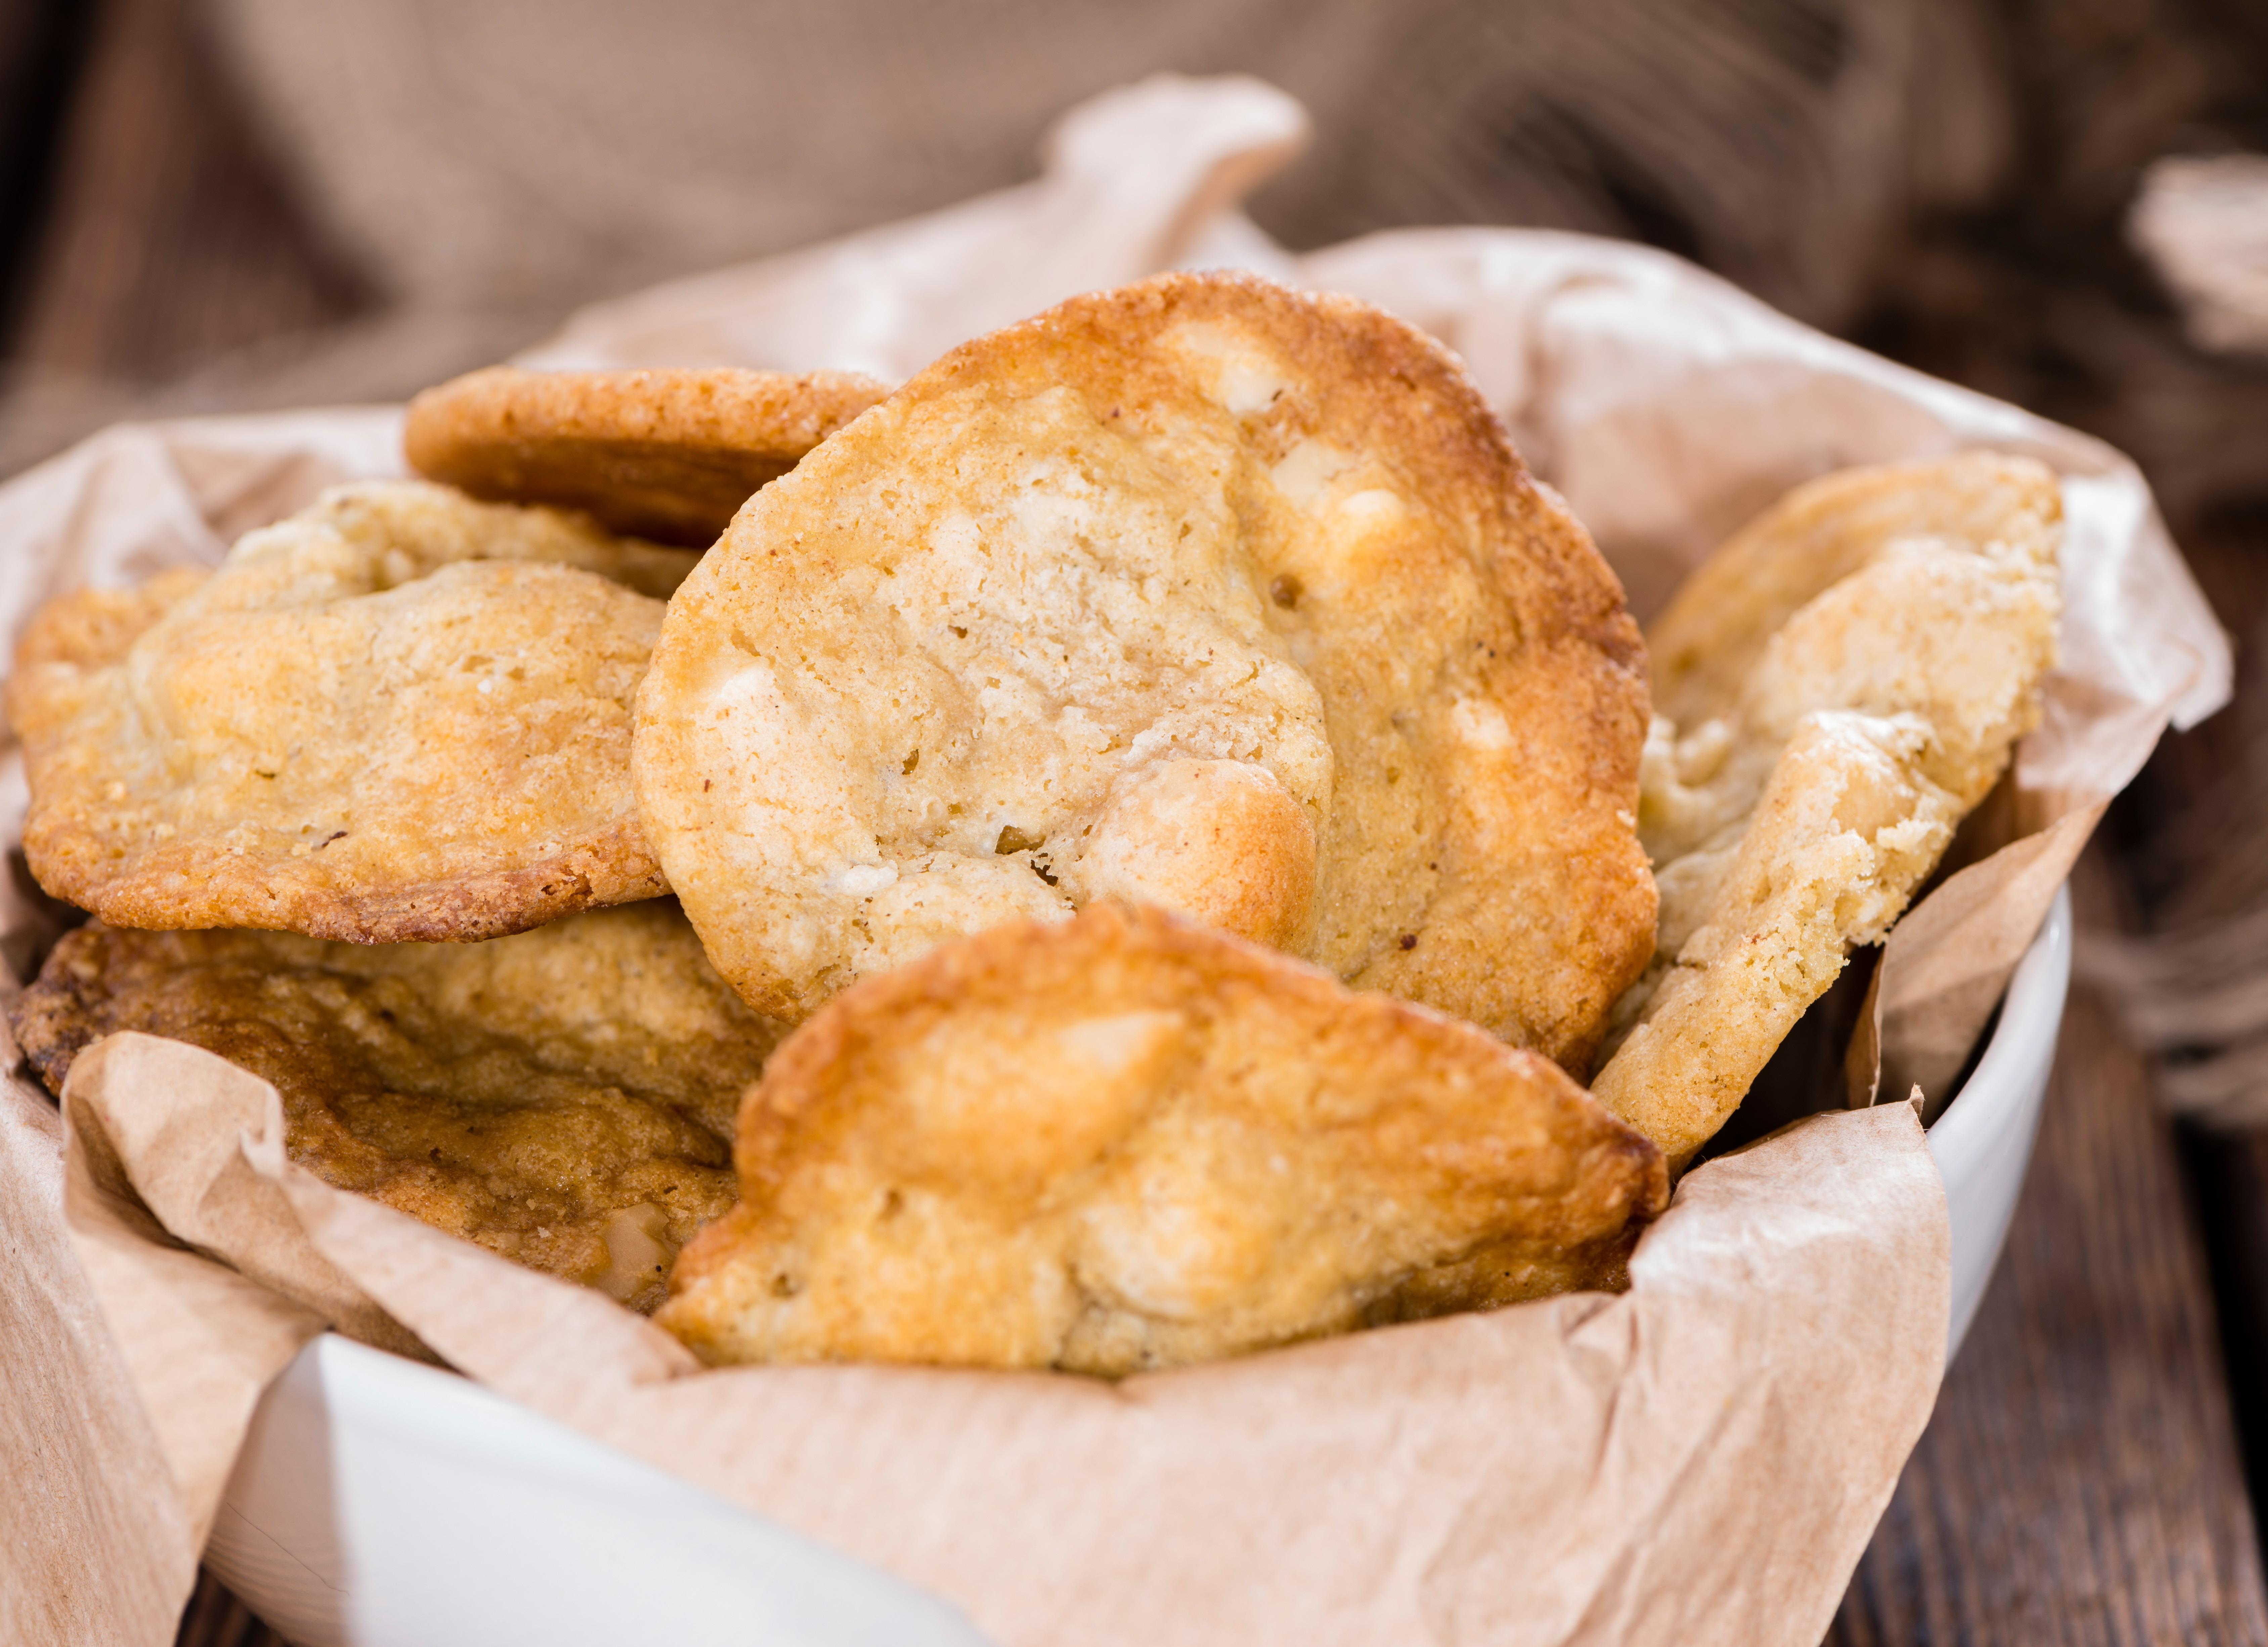 Macadamia Nut White Chocolate Cookies